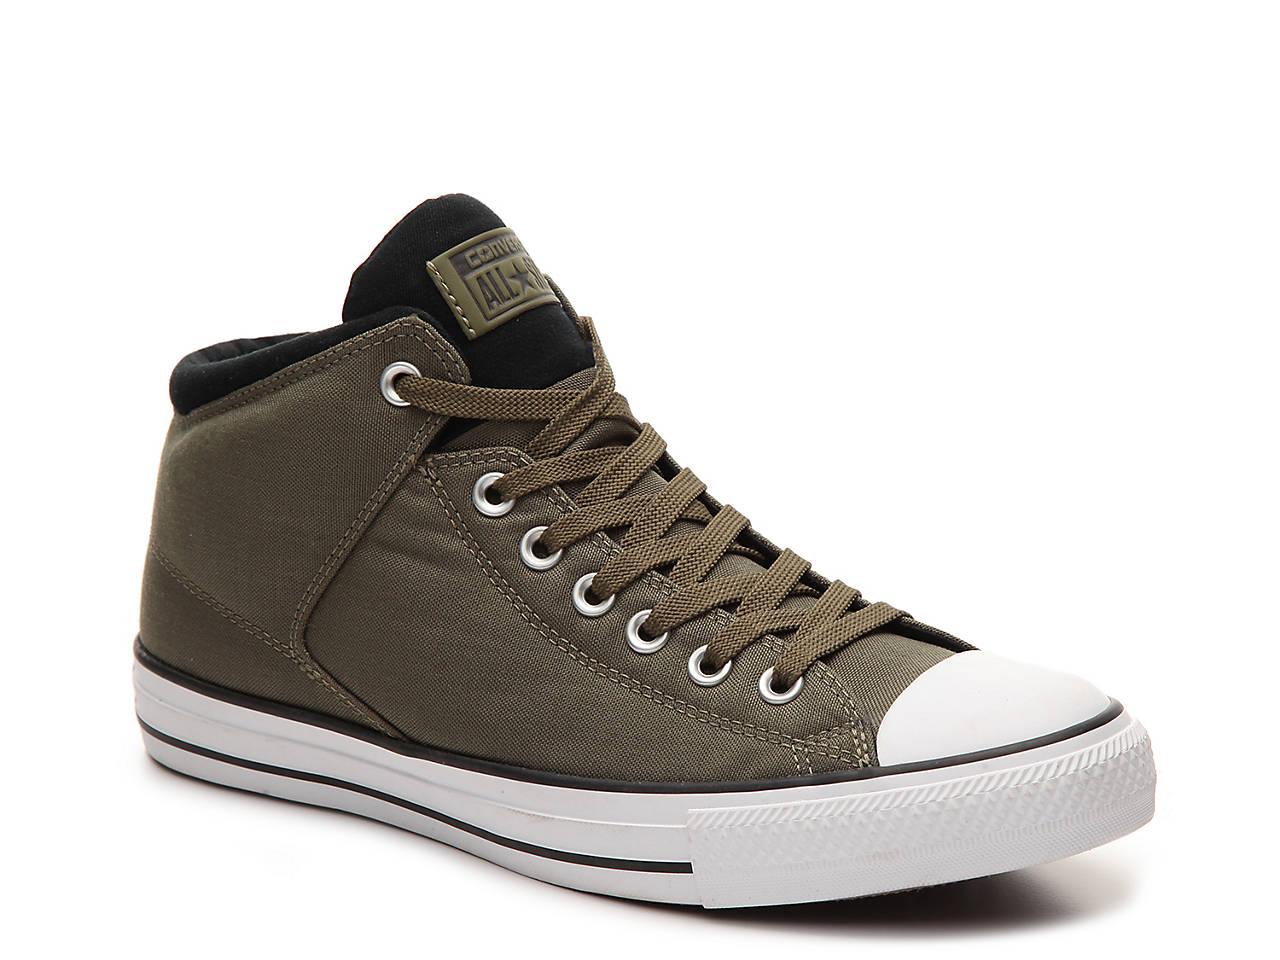 ac689a2b6ad Converse. Chuck Taylor All Star Street Cordura High-Top Sneaker ...